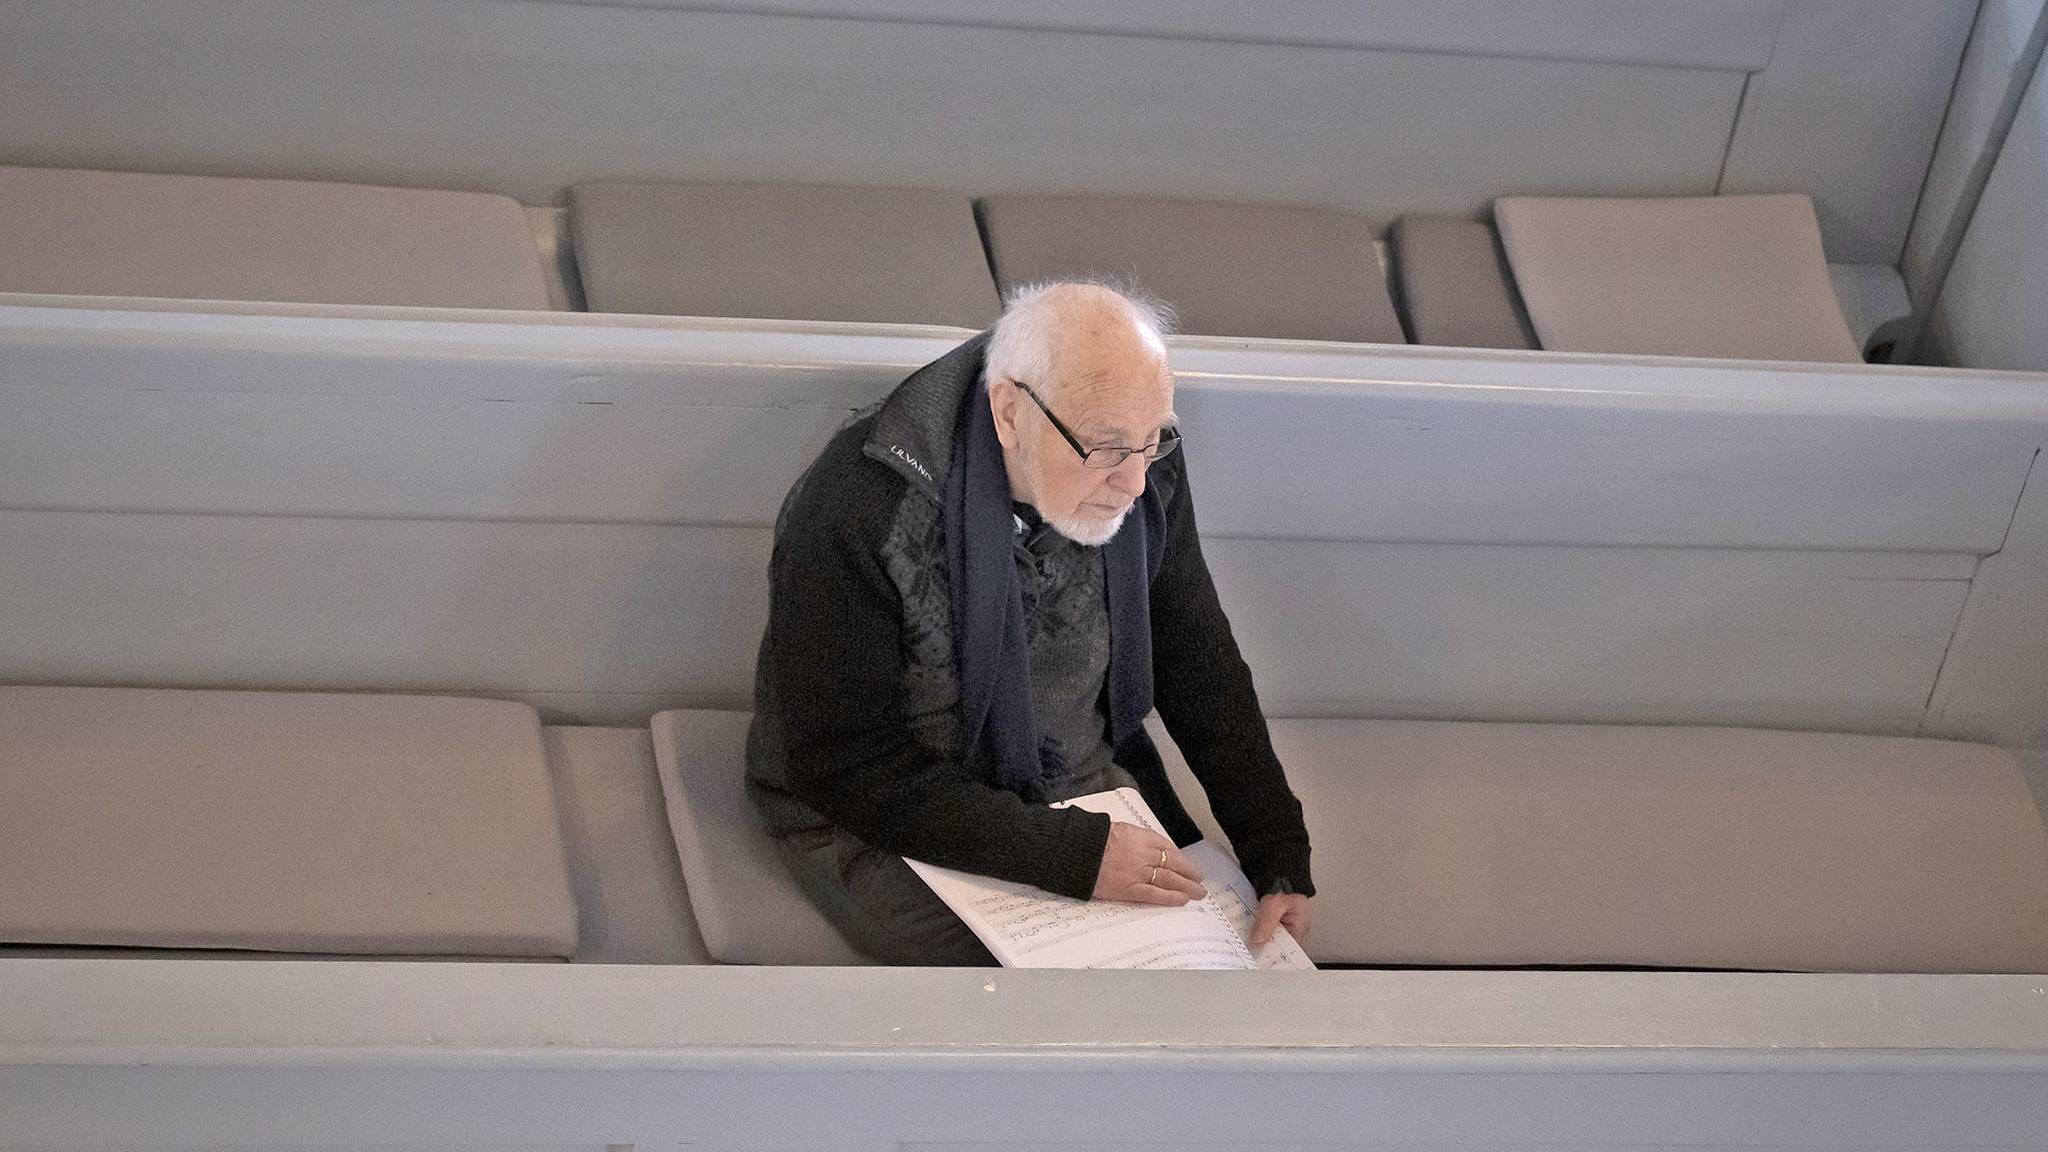 Eiliv Grue har bearbeidet Falkberget-tekster, som har dannet grunnlaget for Plagges nye kammeropera. Han fulgte ivrig med under øvingen i februar. Foto: Kurt Näslund.